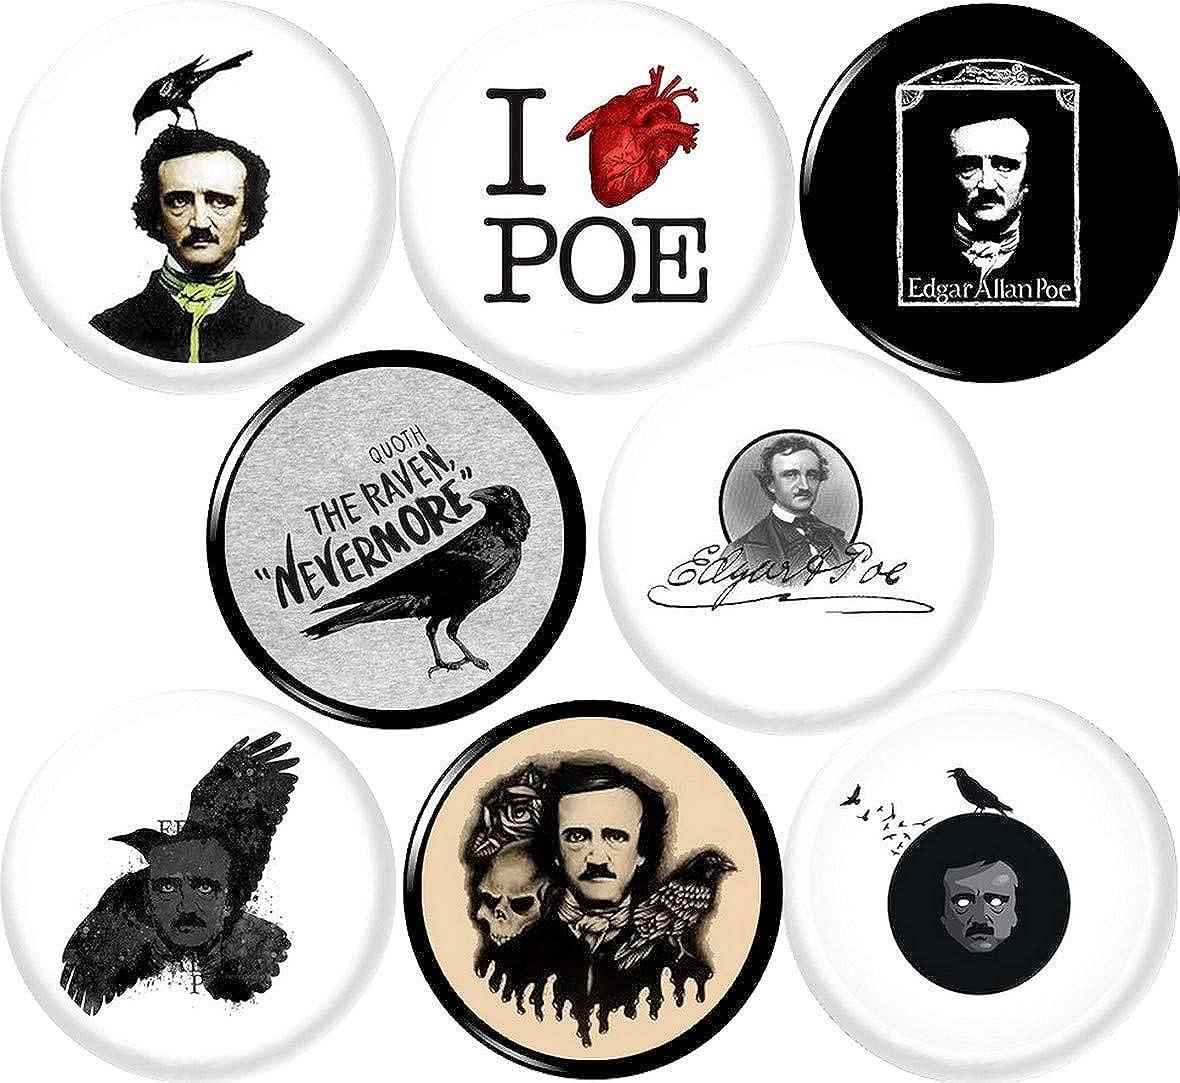 Edgar Allan POE 8 New 1